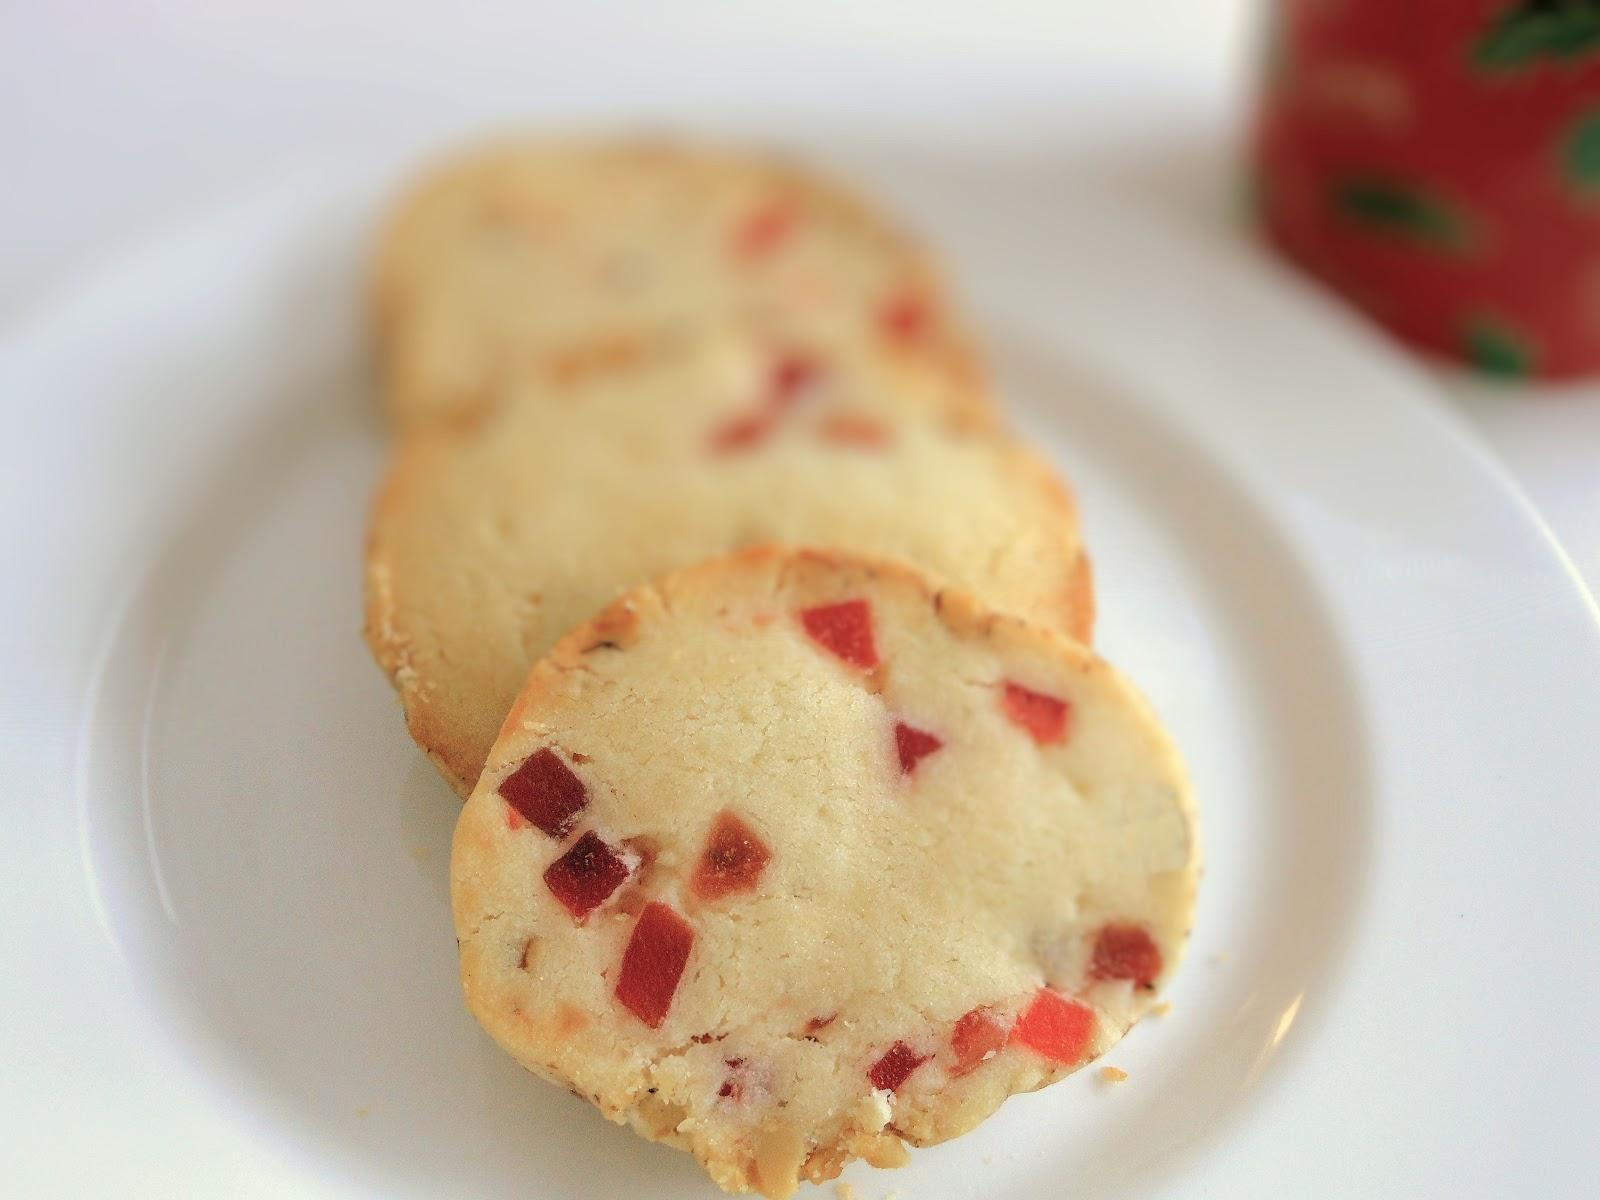 Shortbread Cookies with Fruit